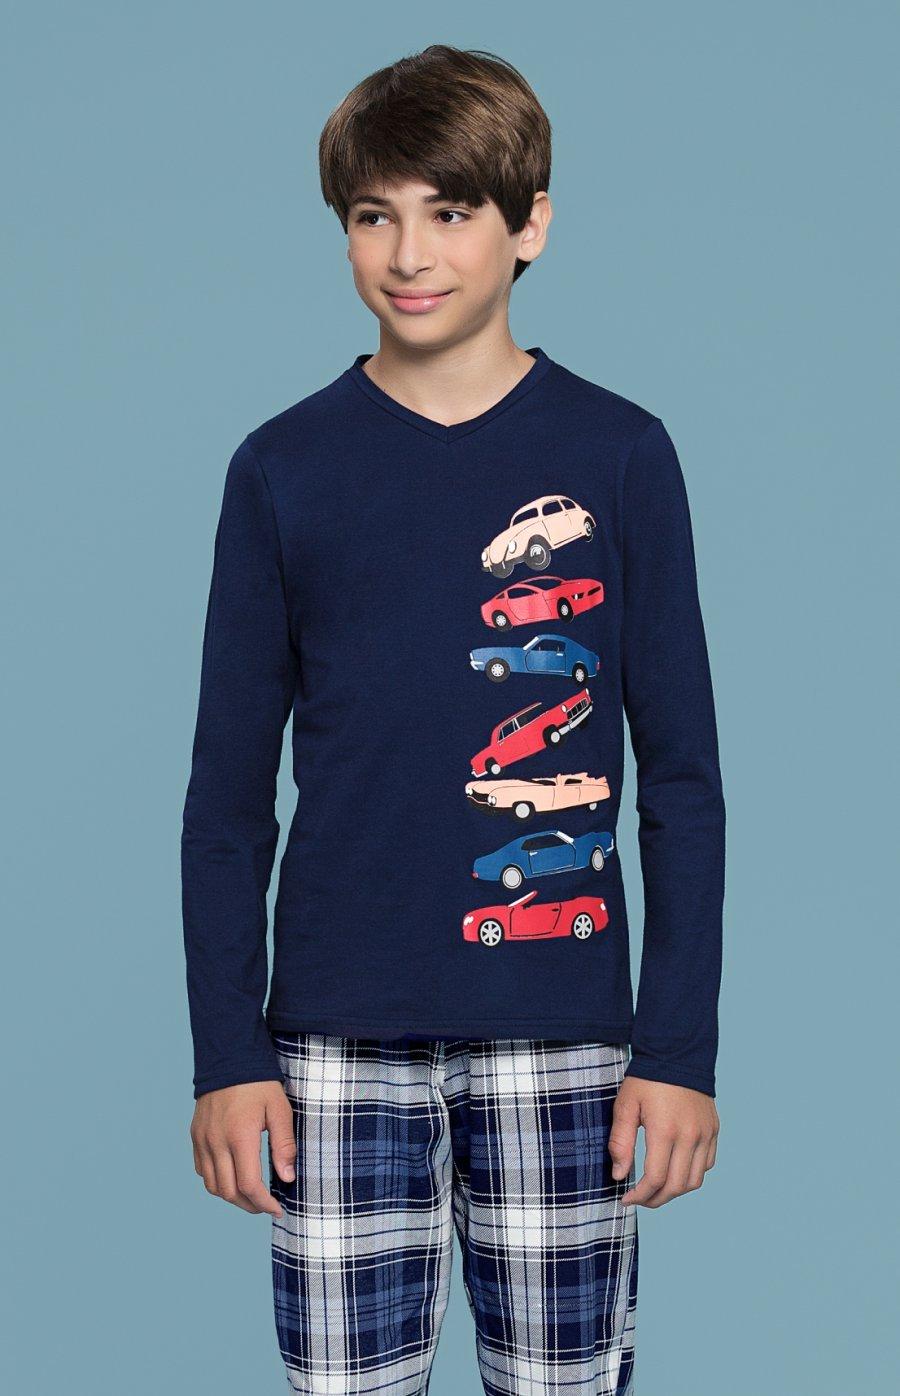 Pijama Infantil Sky PROMO Inverno 2018